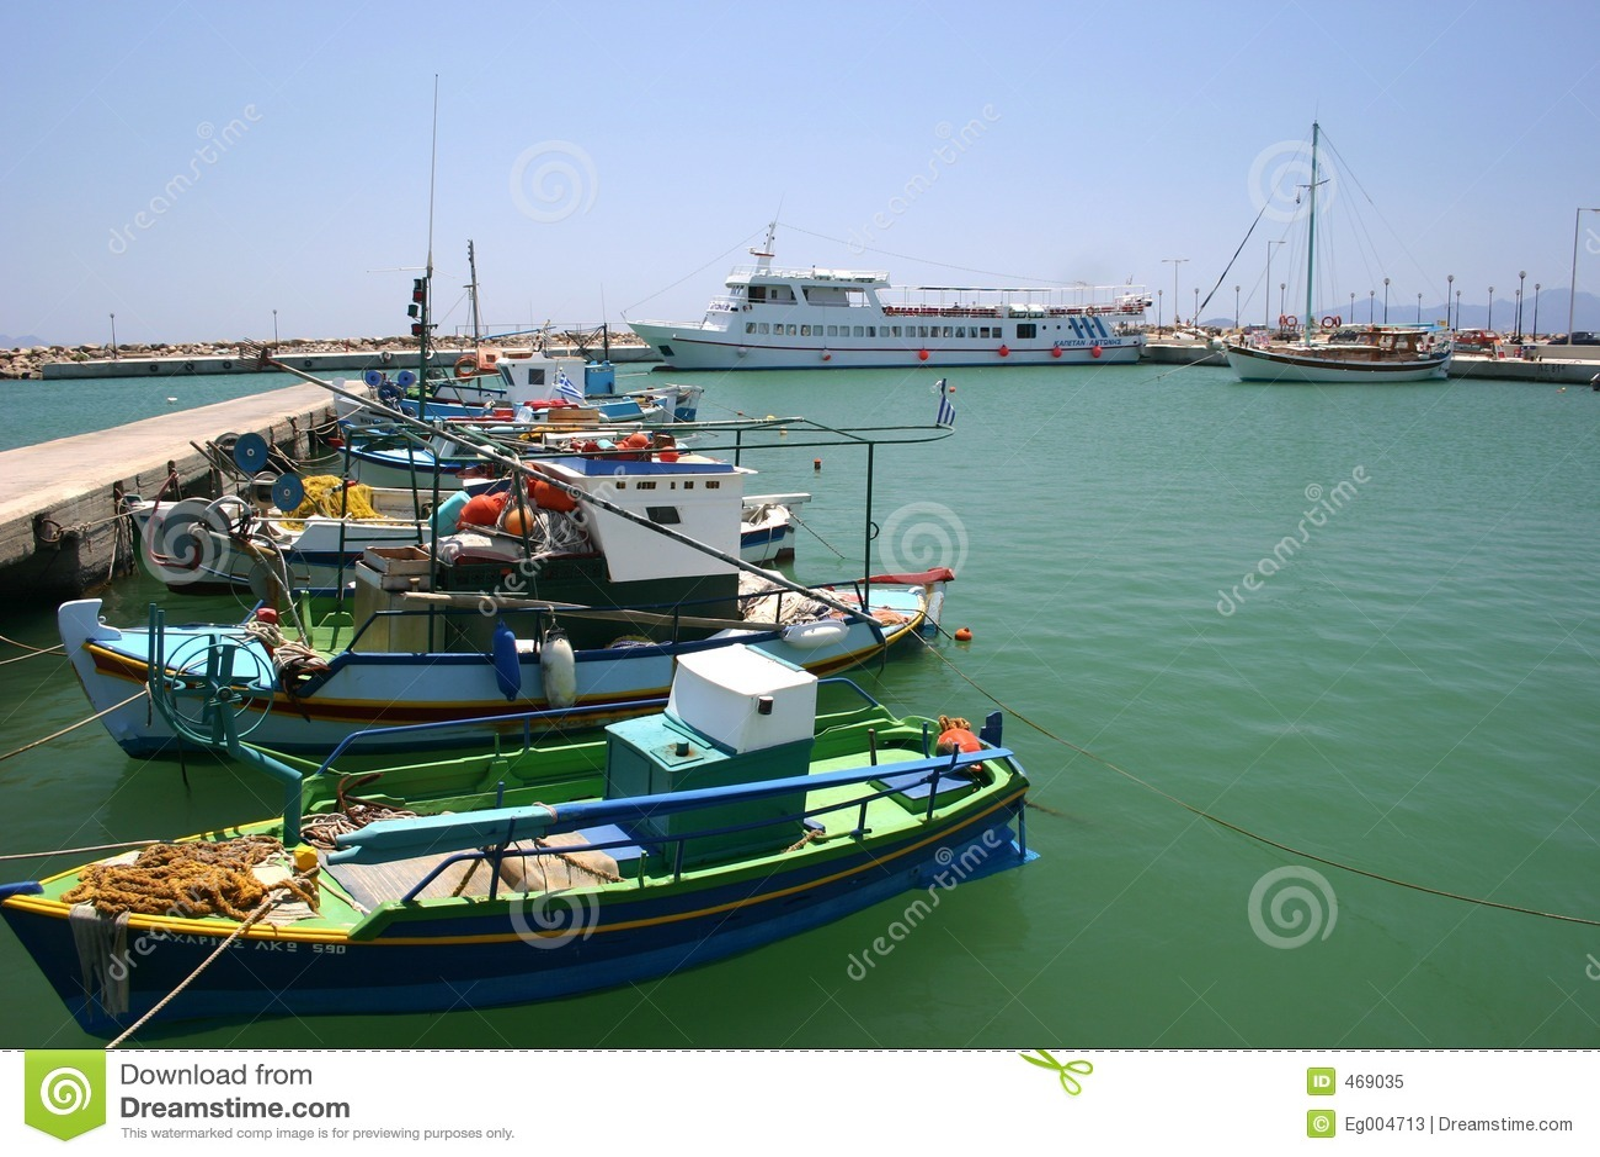 Fishing boats royalty free stock photo image 469035 for Free fishing boats